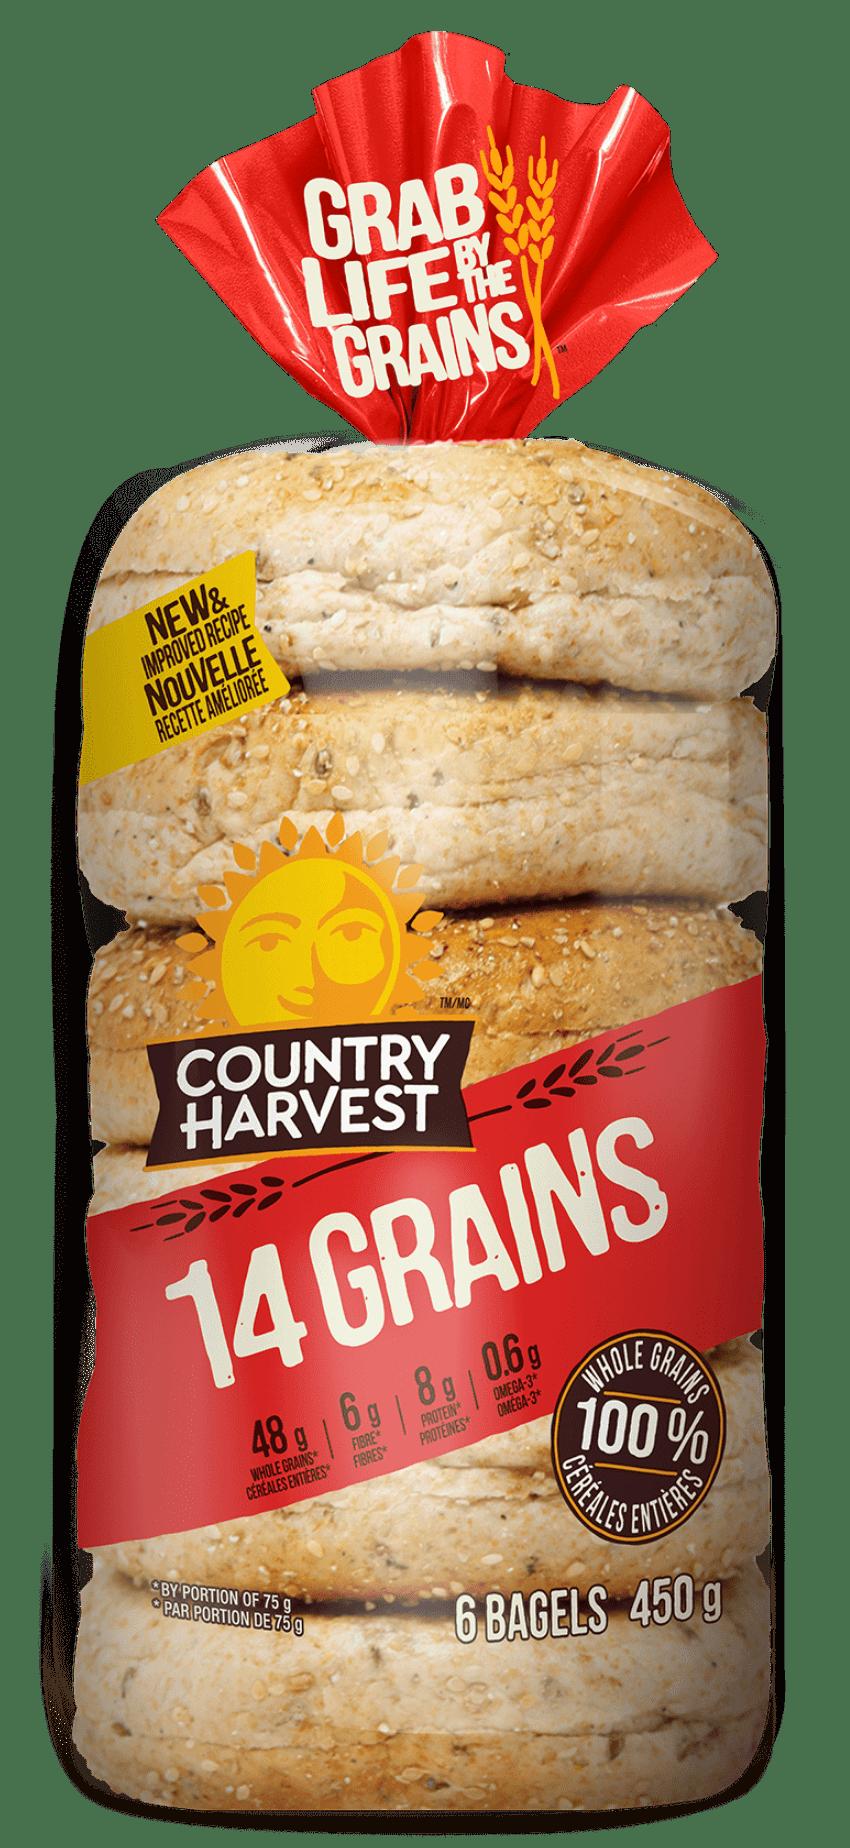 Country-Harvest-14-Grains-Bagel-Pack